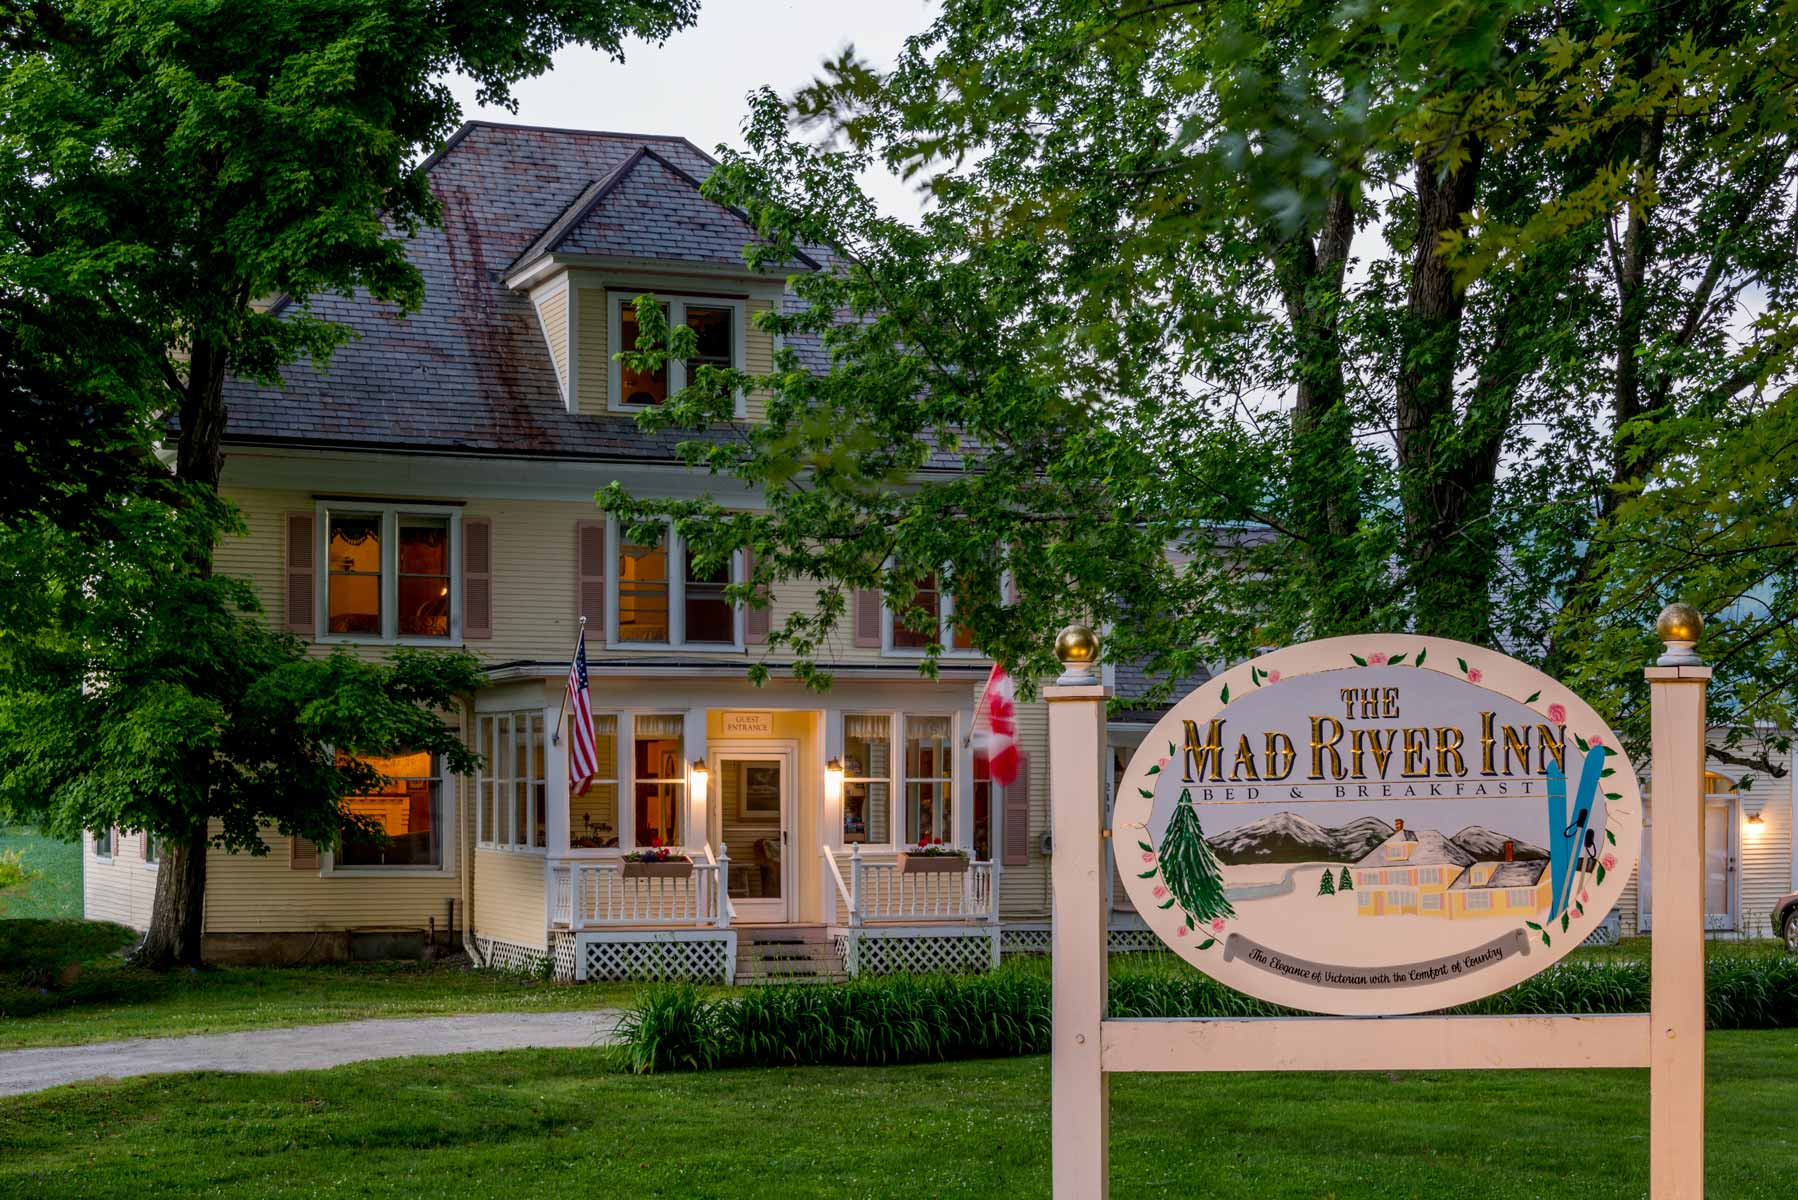 The Mad River Inn